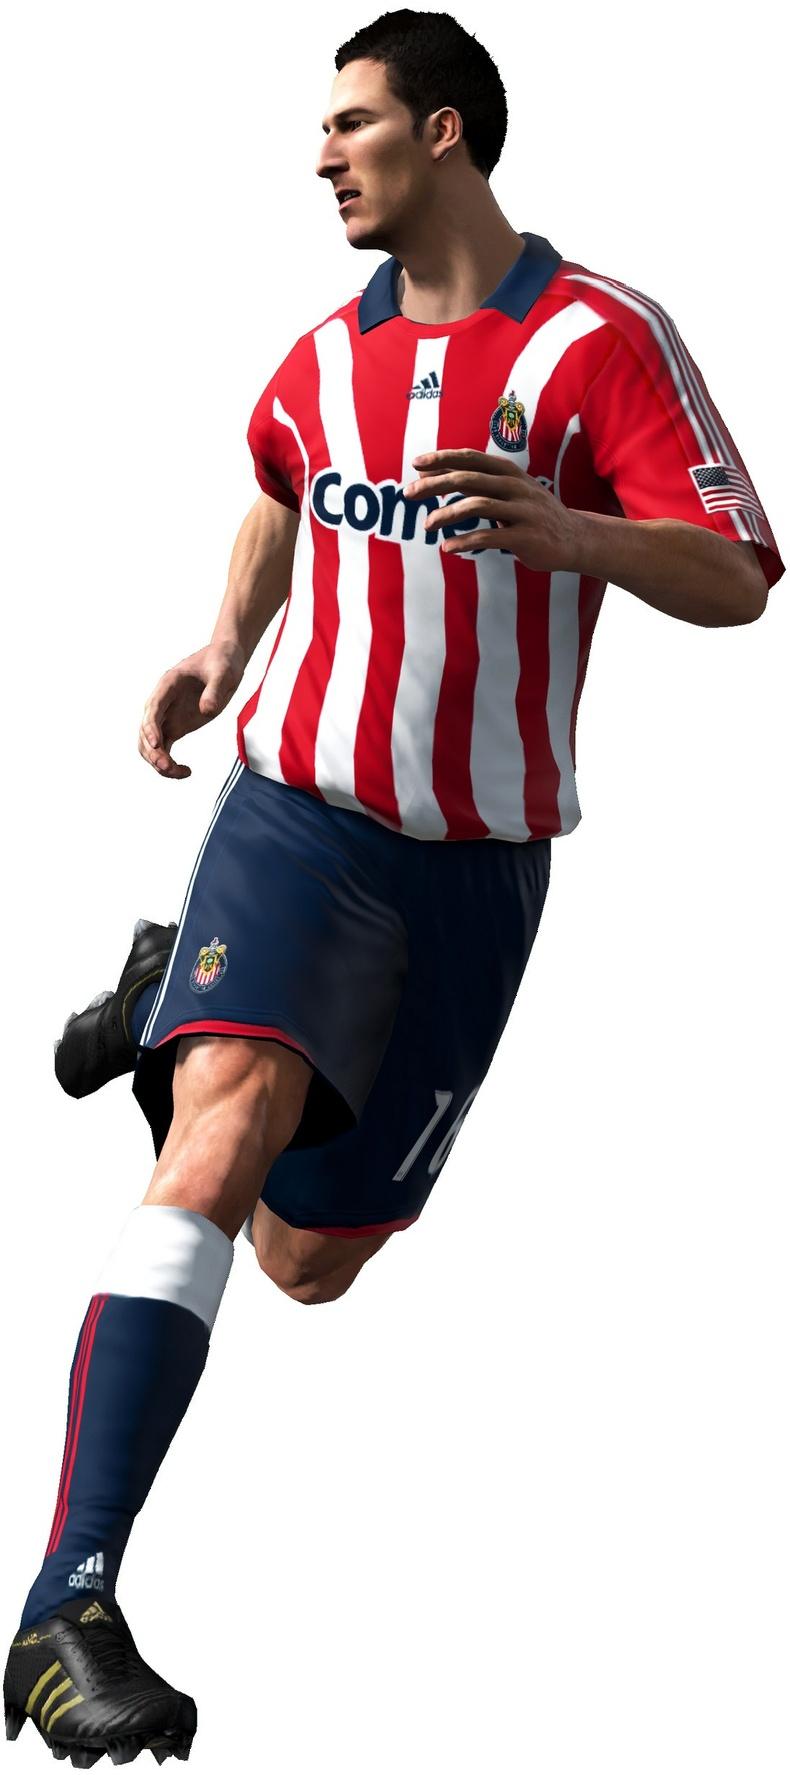 FIFA Soccer 2010 Demo Download-960428_20090824_790screen003.jpg